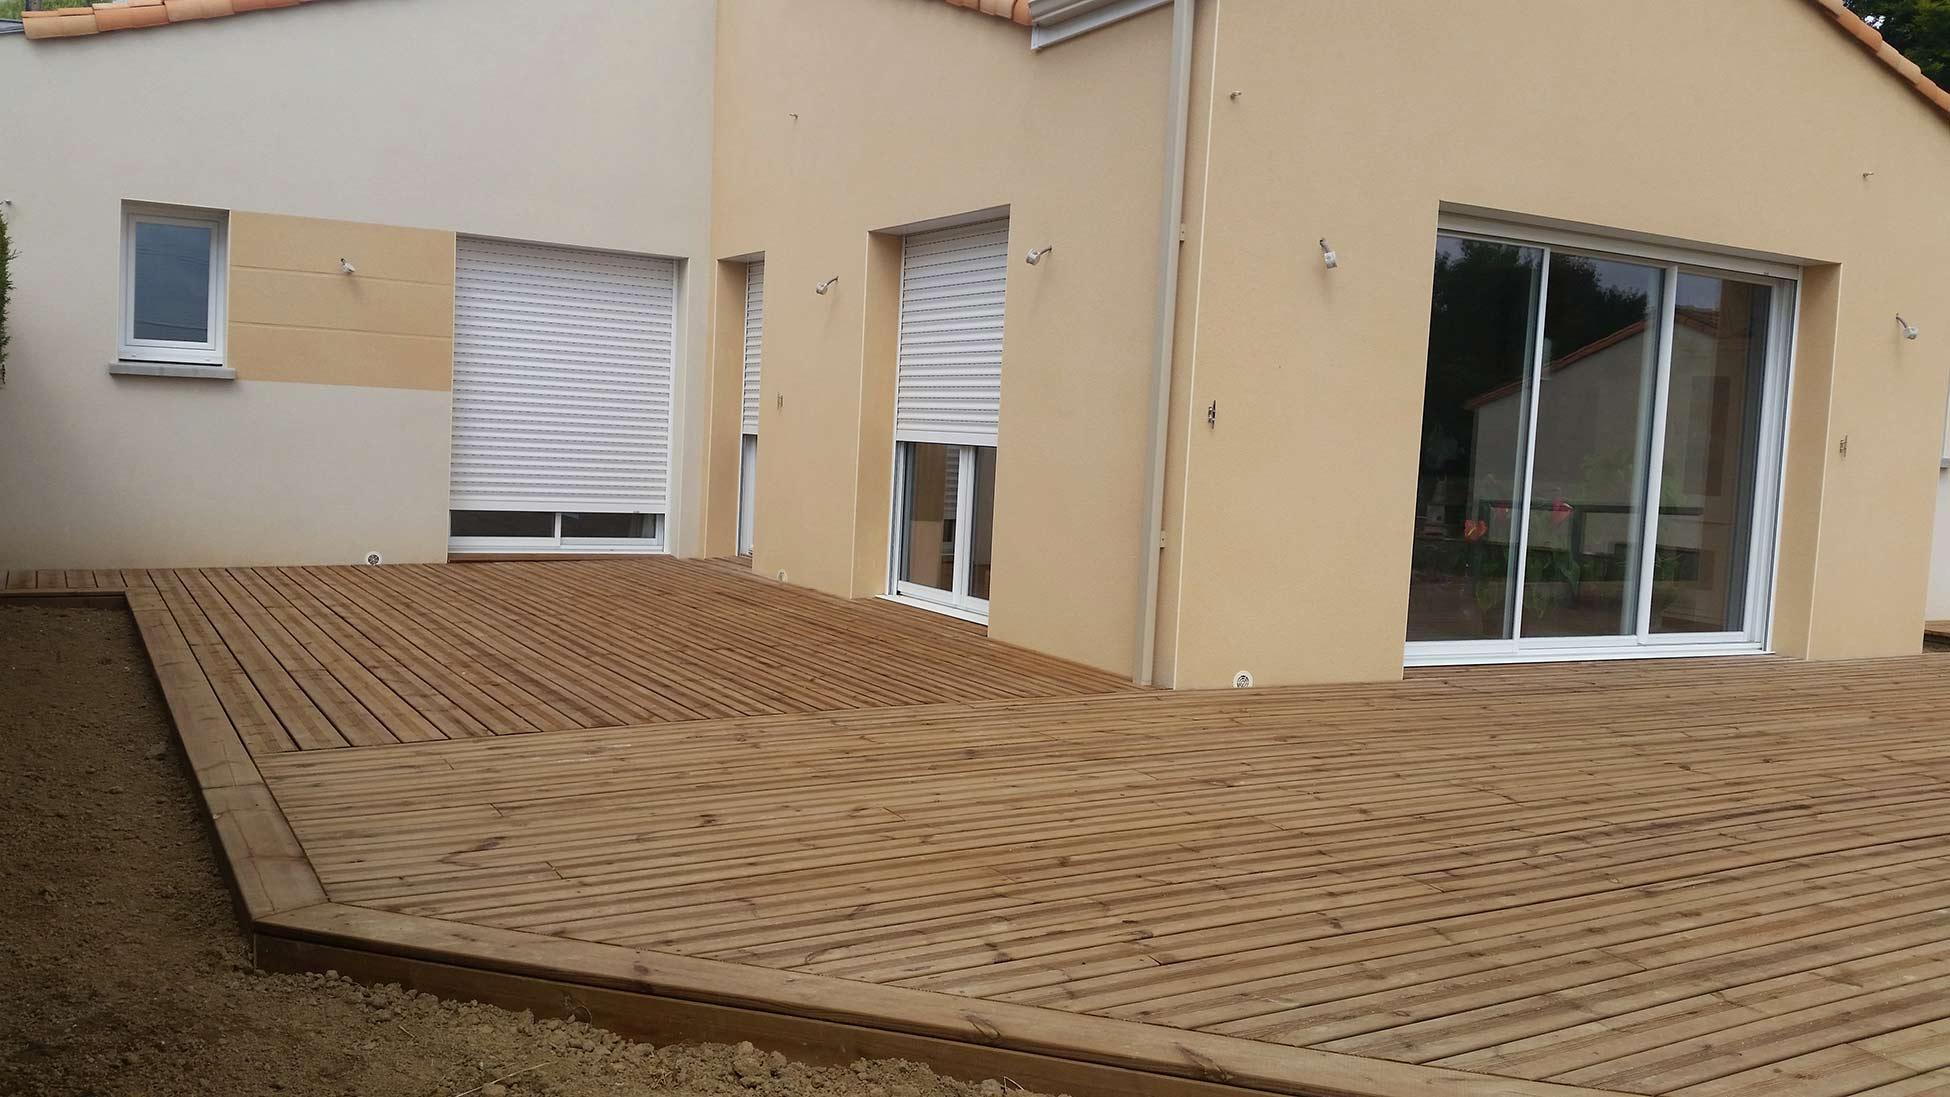 terrasses bois composite ste pazanne carrelage terrasses travertin 44. Black Bedroom Furniture Sets. Home Design Ideas